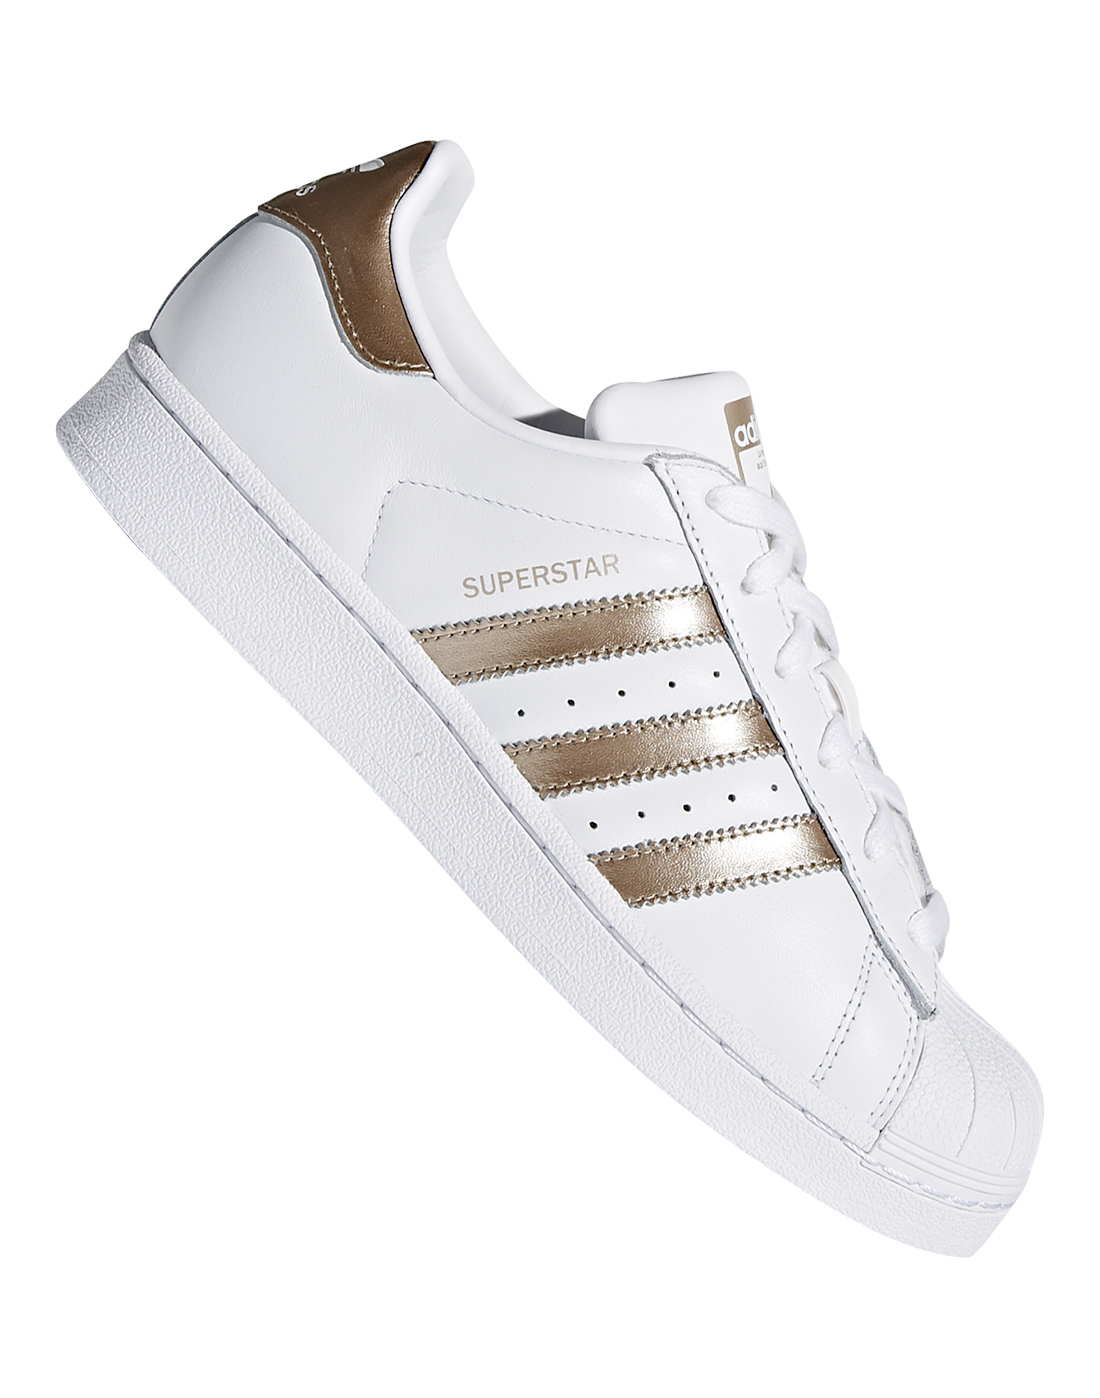 adidas Originals. Womens Superstar. Womens Superstar ... a6349ce4c1